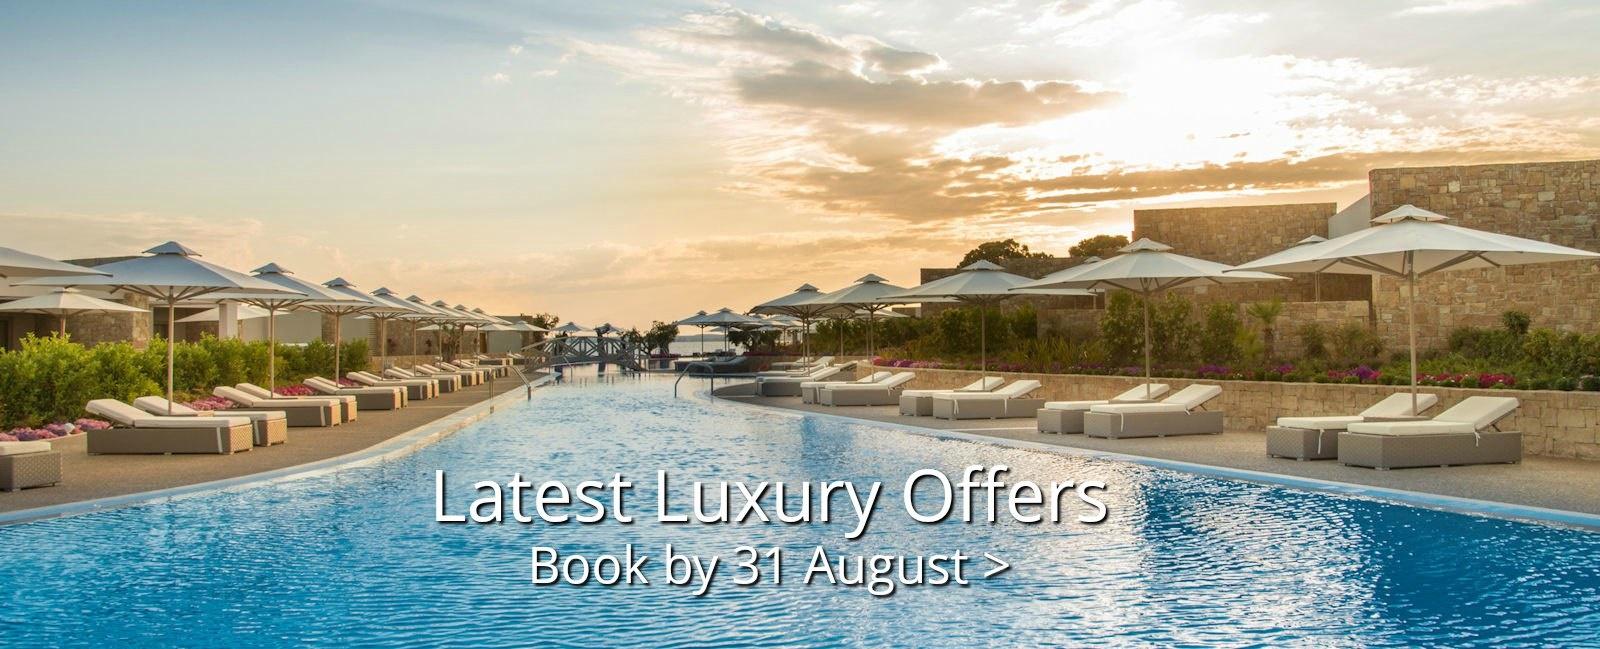 latest luxury offers